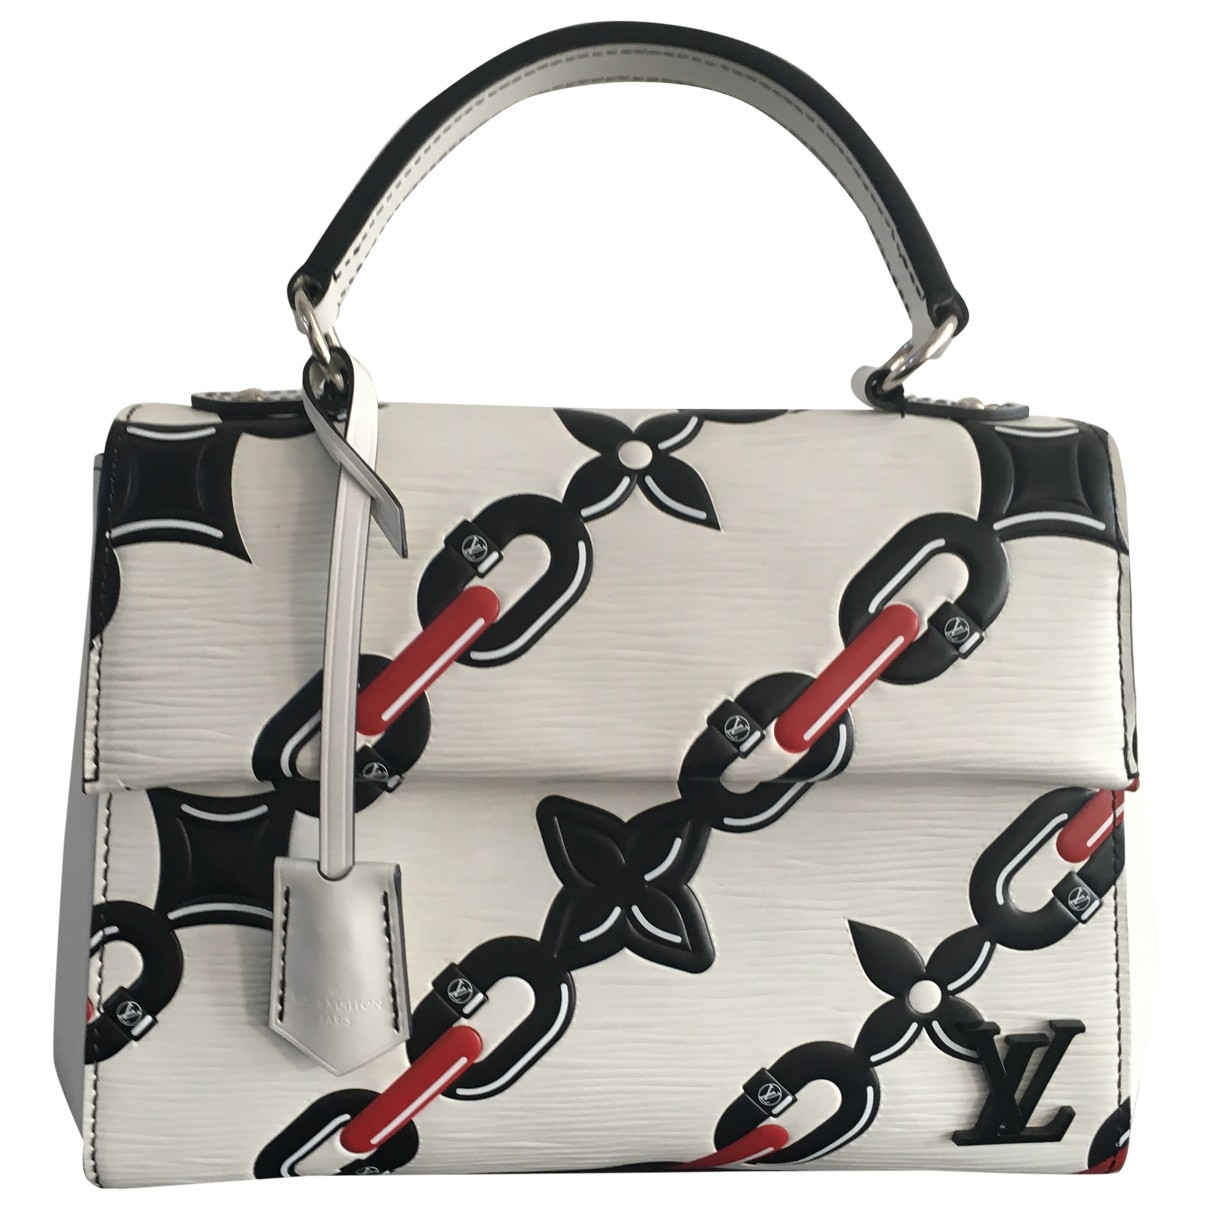 Louis Vuitton - Sac a main Cluny pour femme en cuir